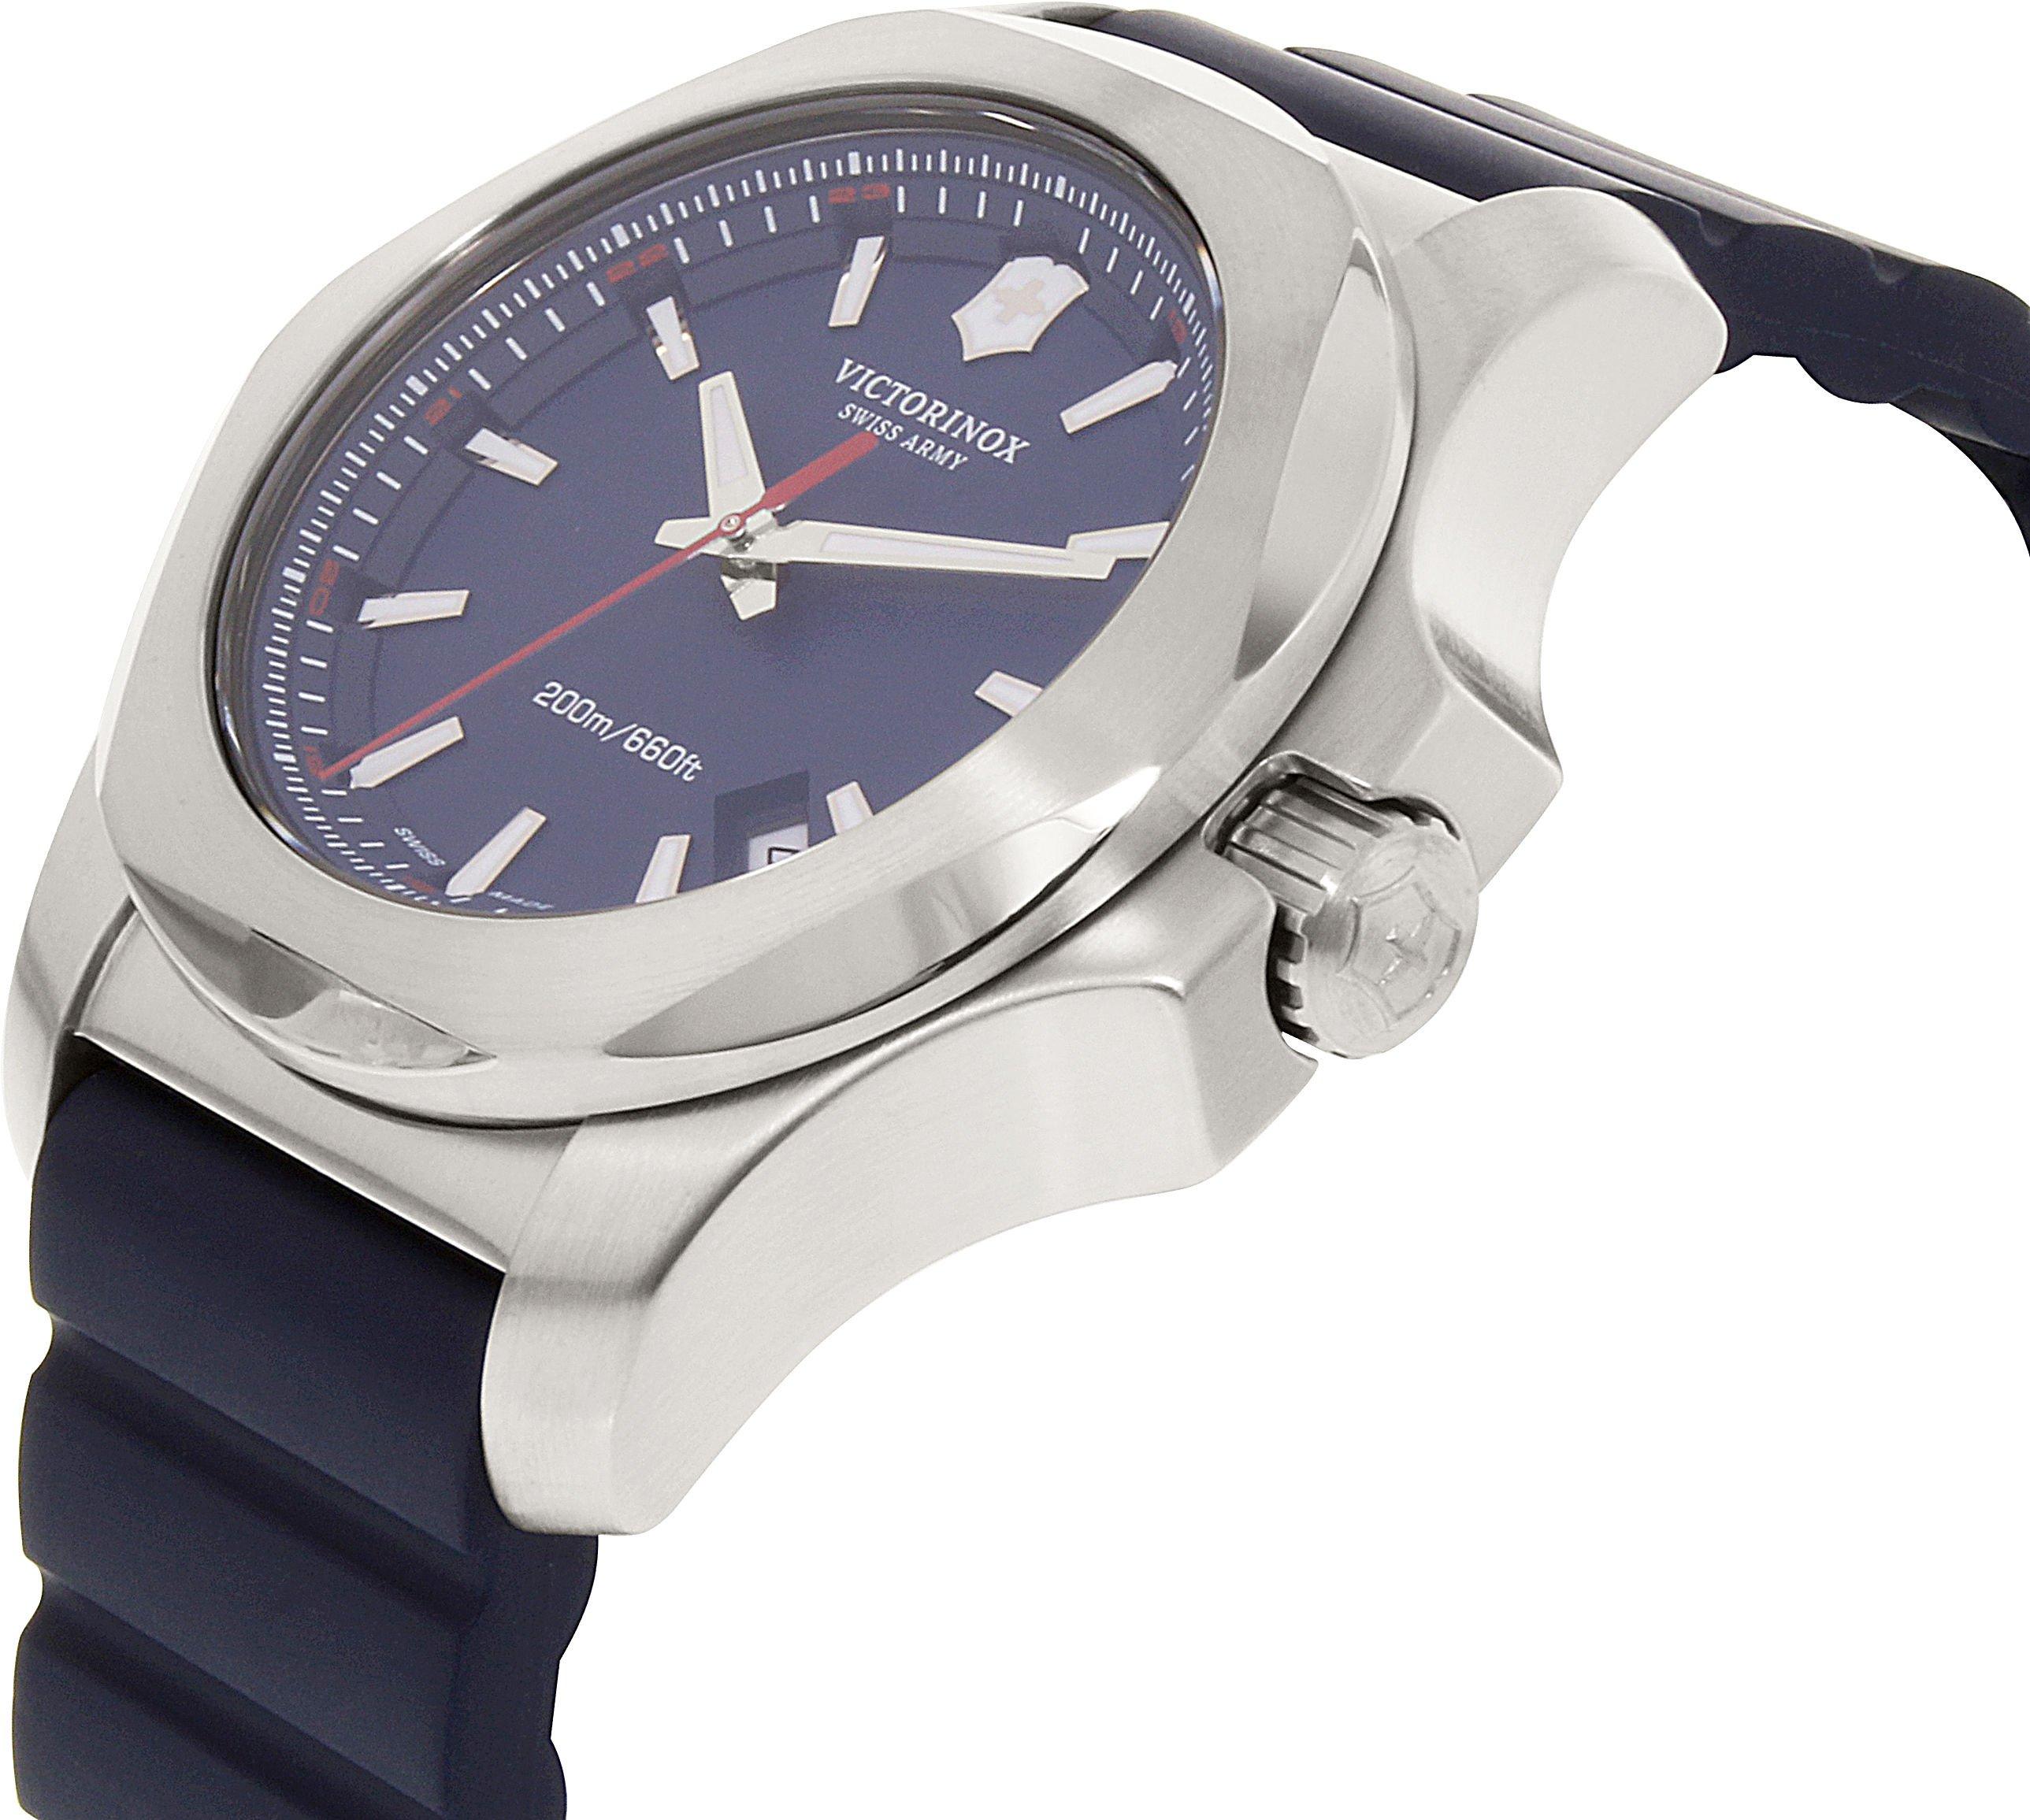 Victorinox Swiss Army Watch I N O X Victorinox Swiss